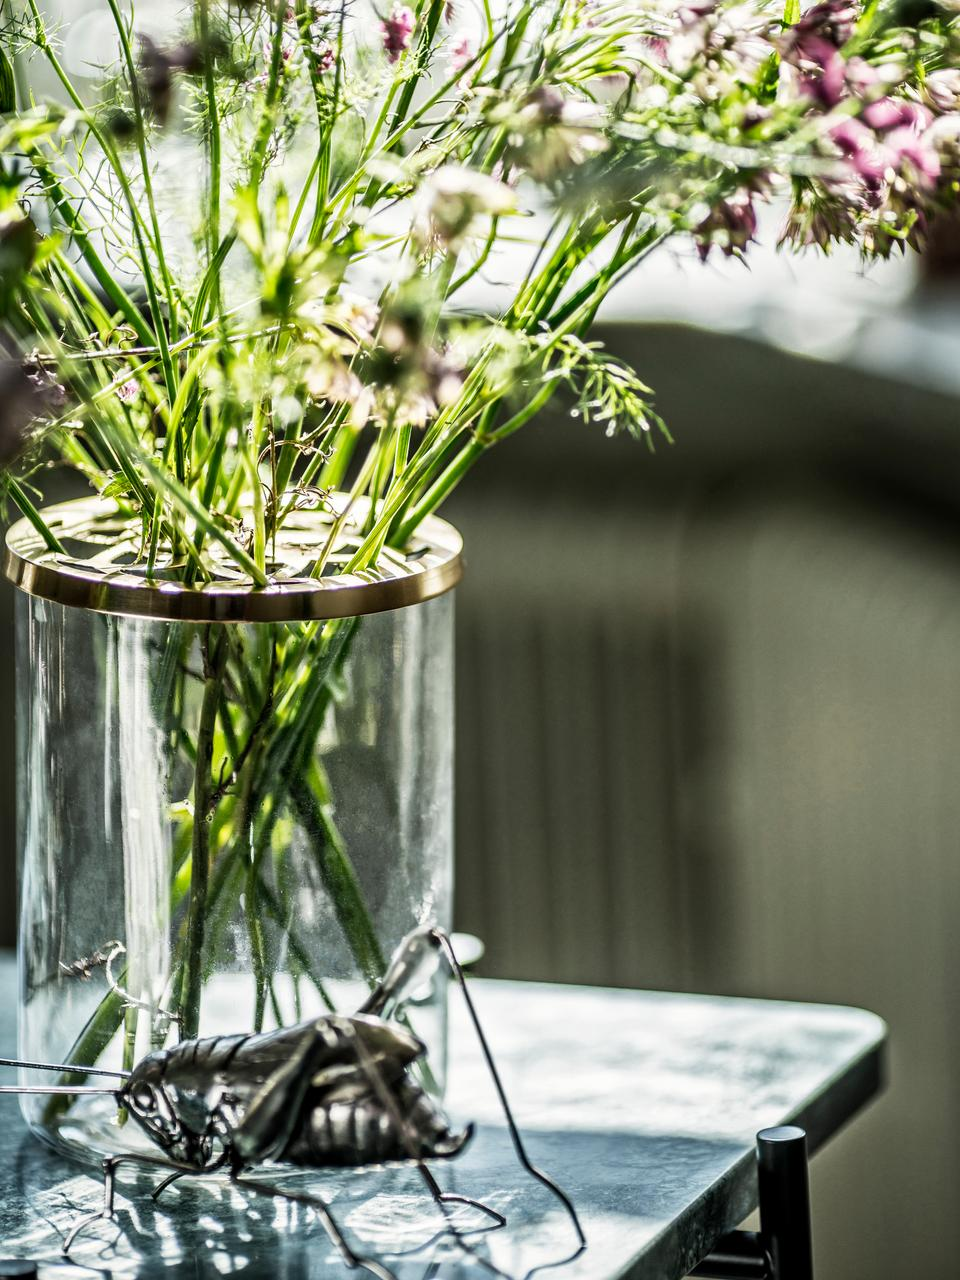 Glas-Vase Lily mit Metalldeckel, Vase: Glas, Deckel: Messing, Vase: Transparent Deckel: Messing, Ø 13 x H 19 cm